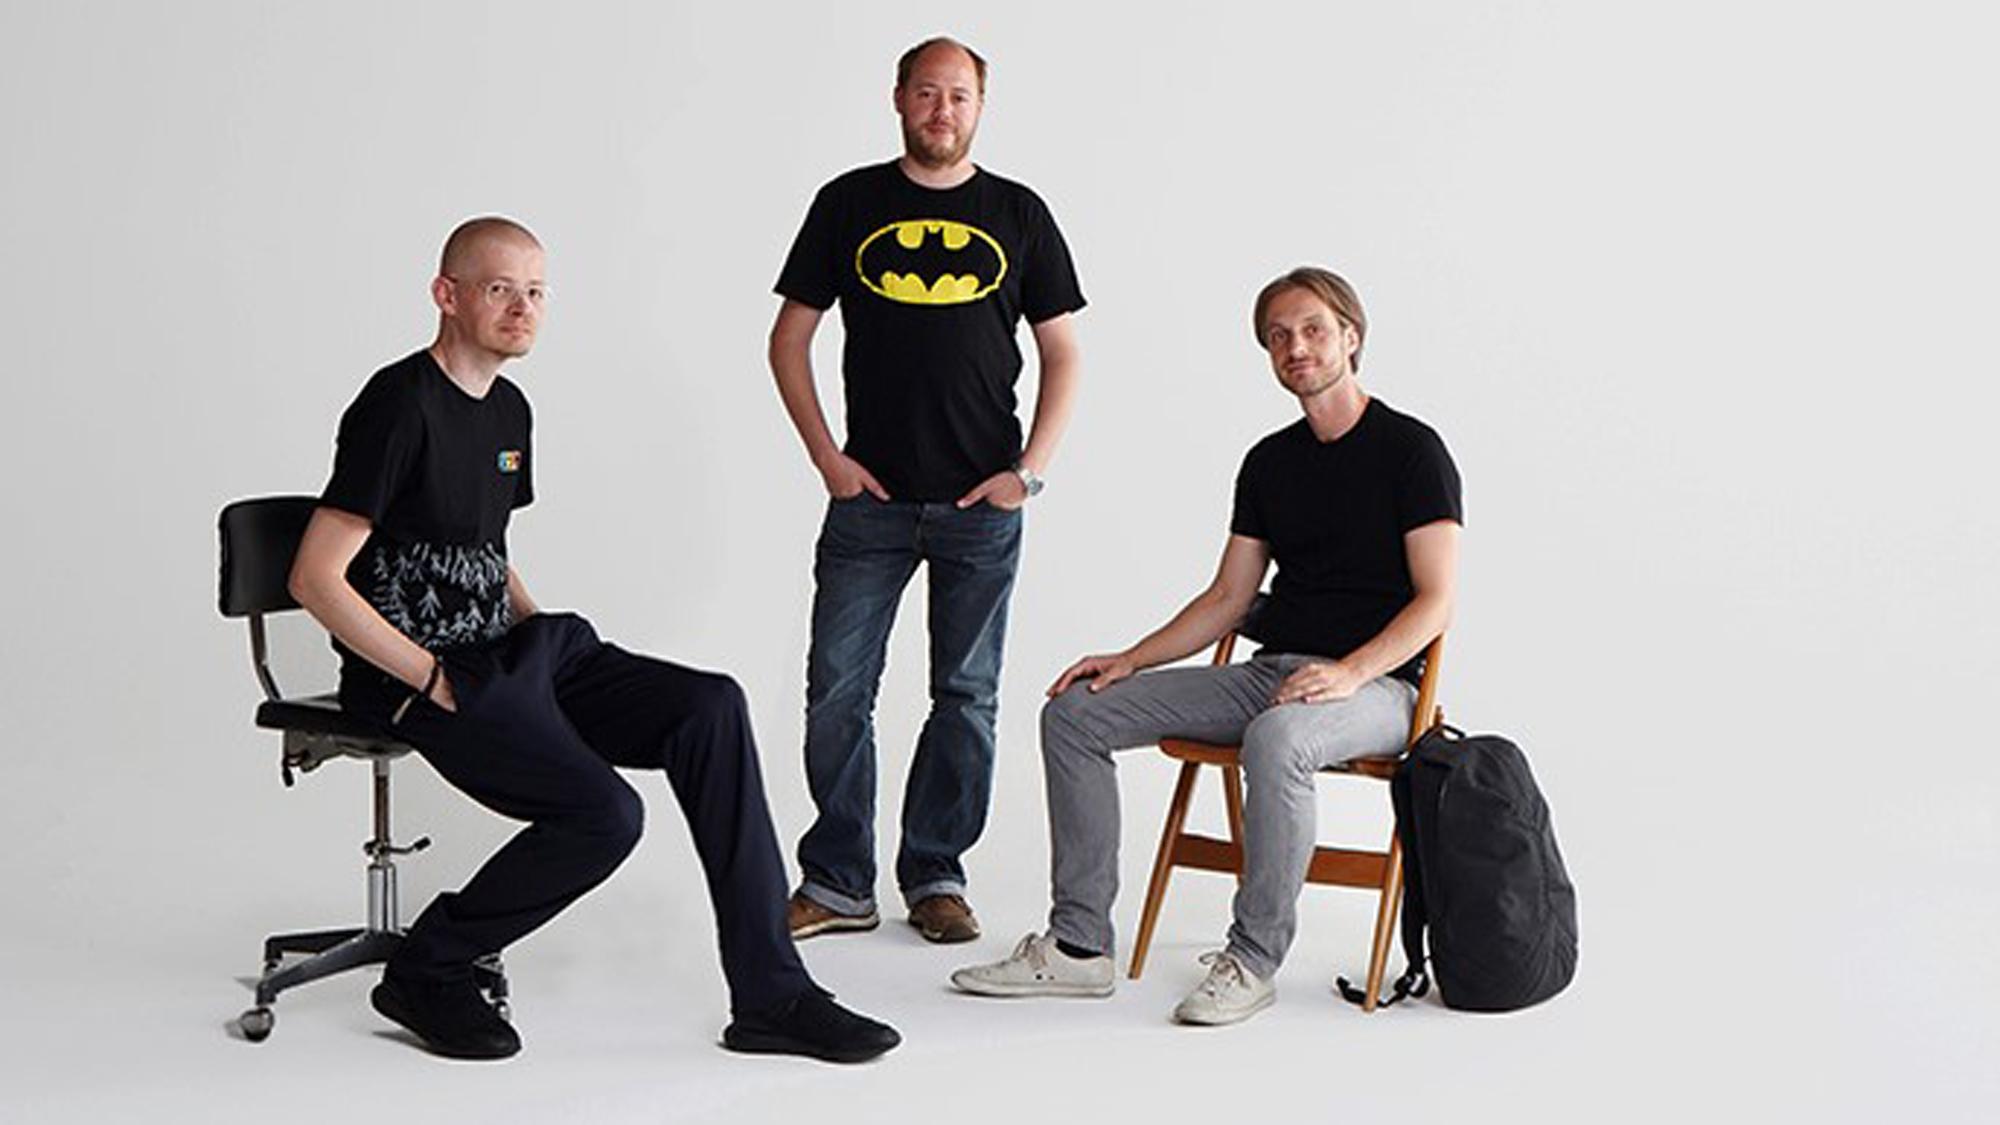 Das Skarabeos-Team: Wolfgang Langeder, Manuel Seckel und Christian Dils. © Skarabeos 2018